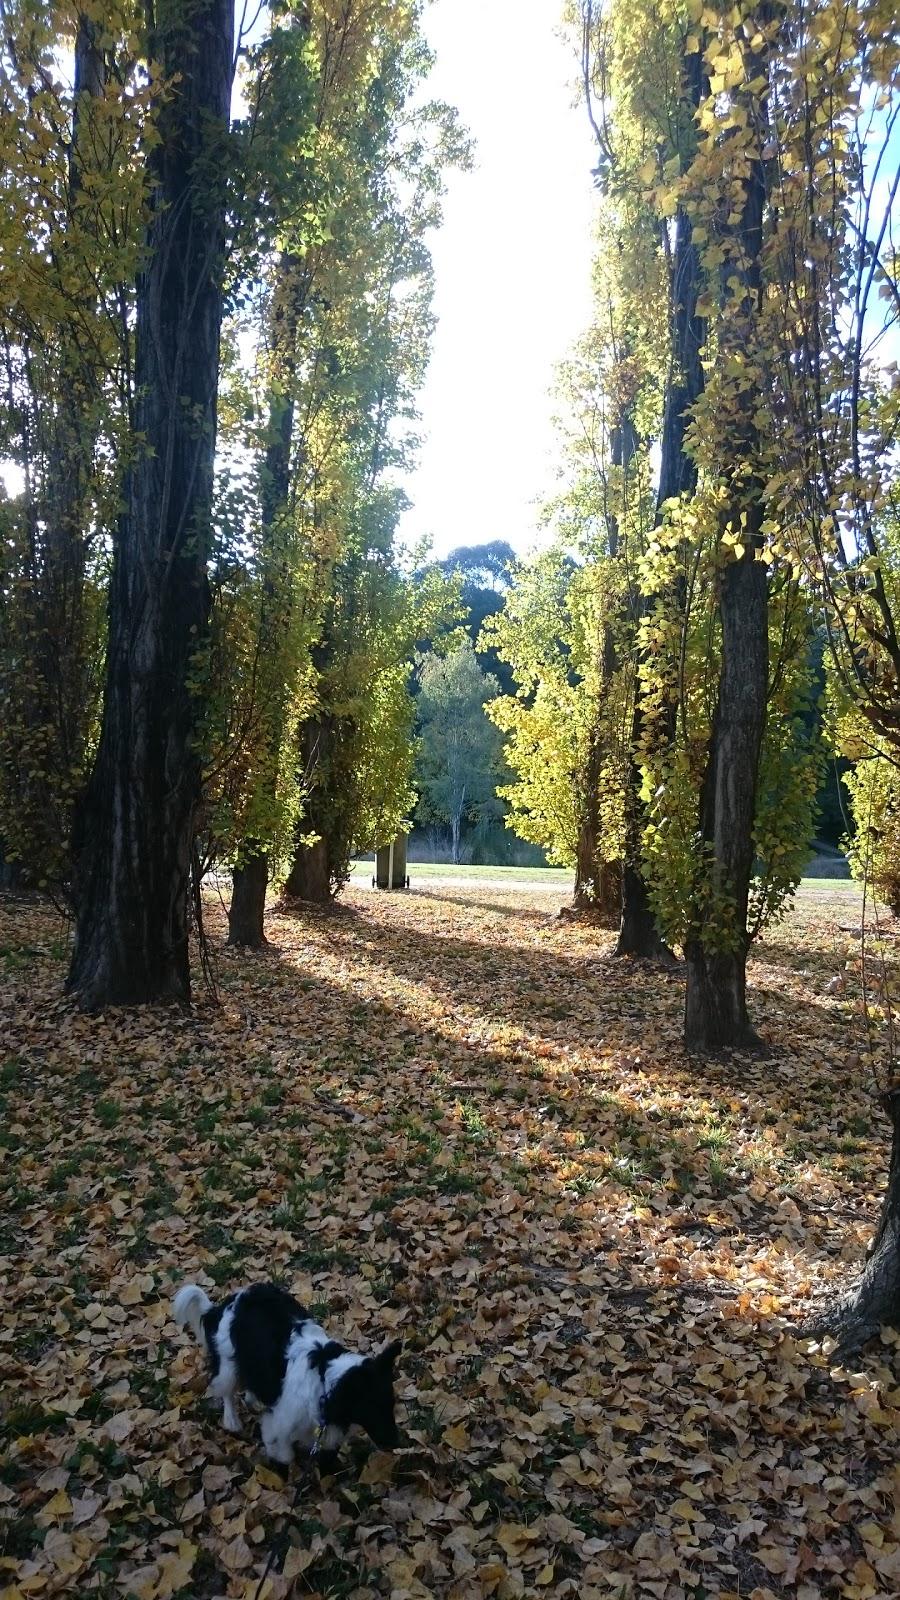 Banjo Paterson Park   park   78 Meehan St, Yass NSW 2582, Australia   0262261477 OR +61 2 6226 1477